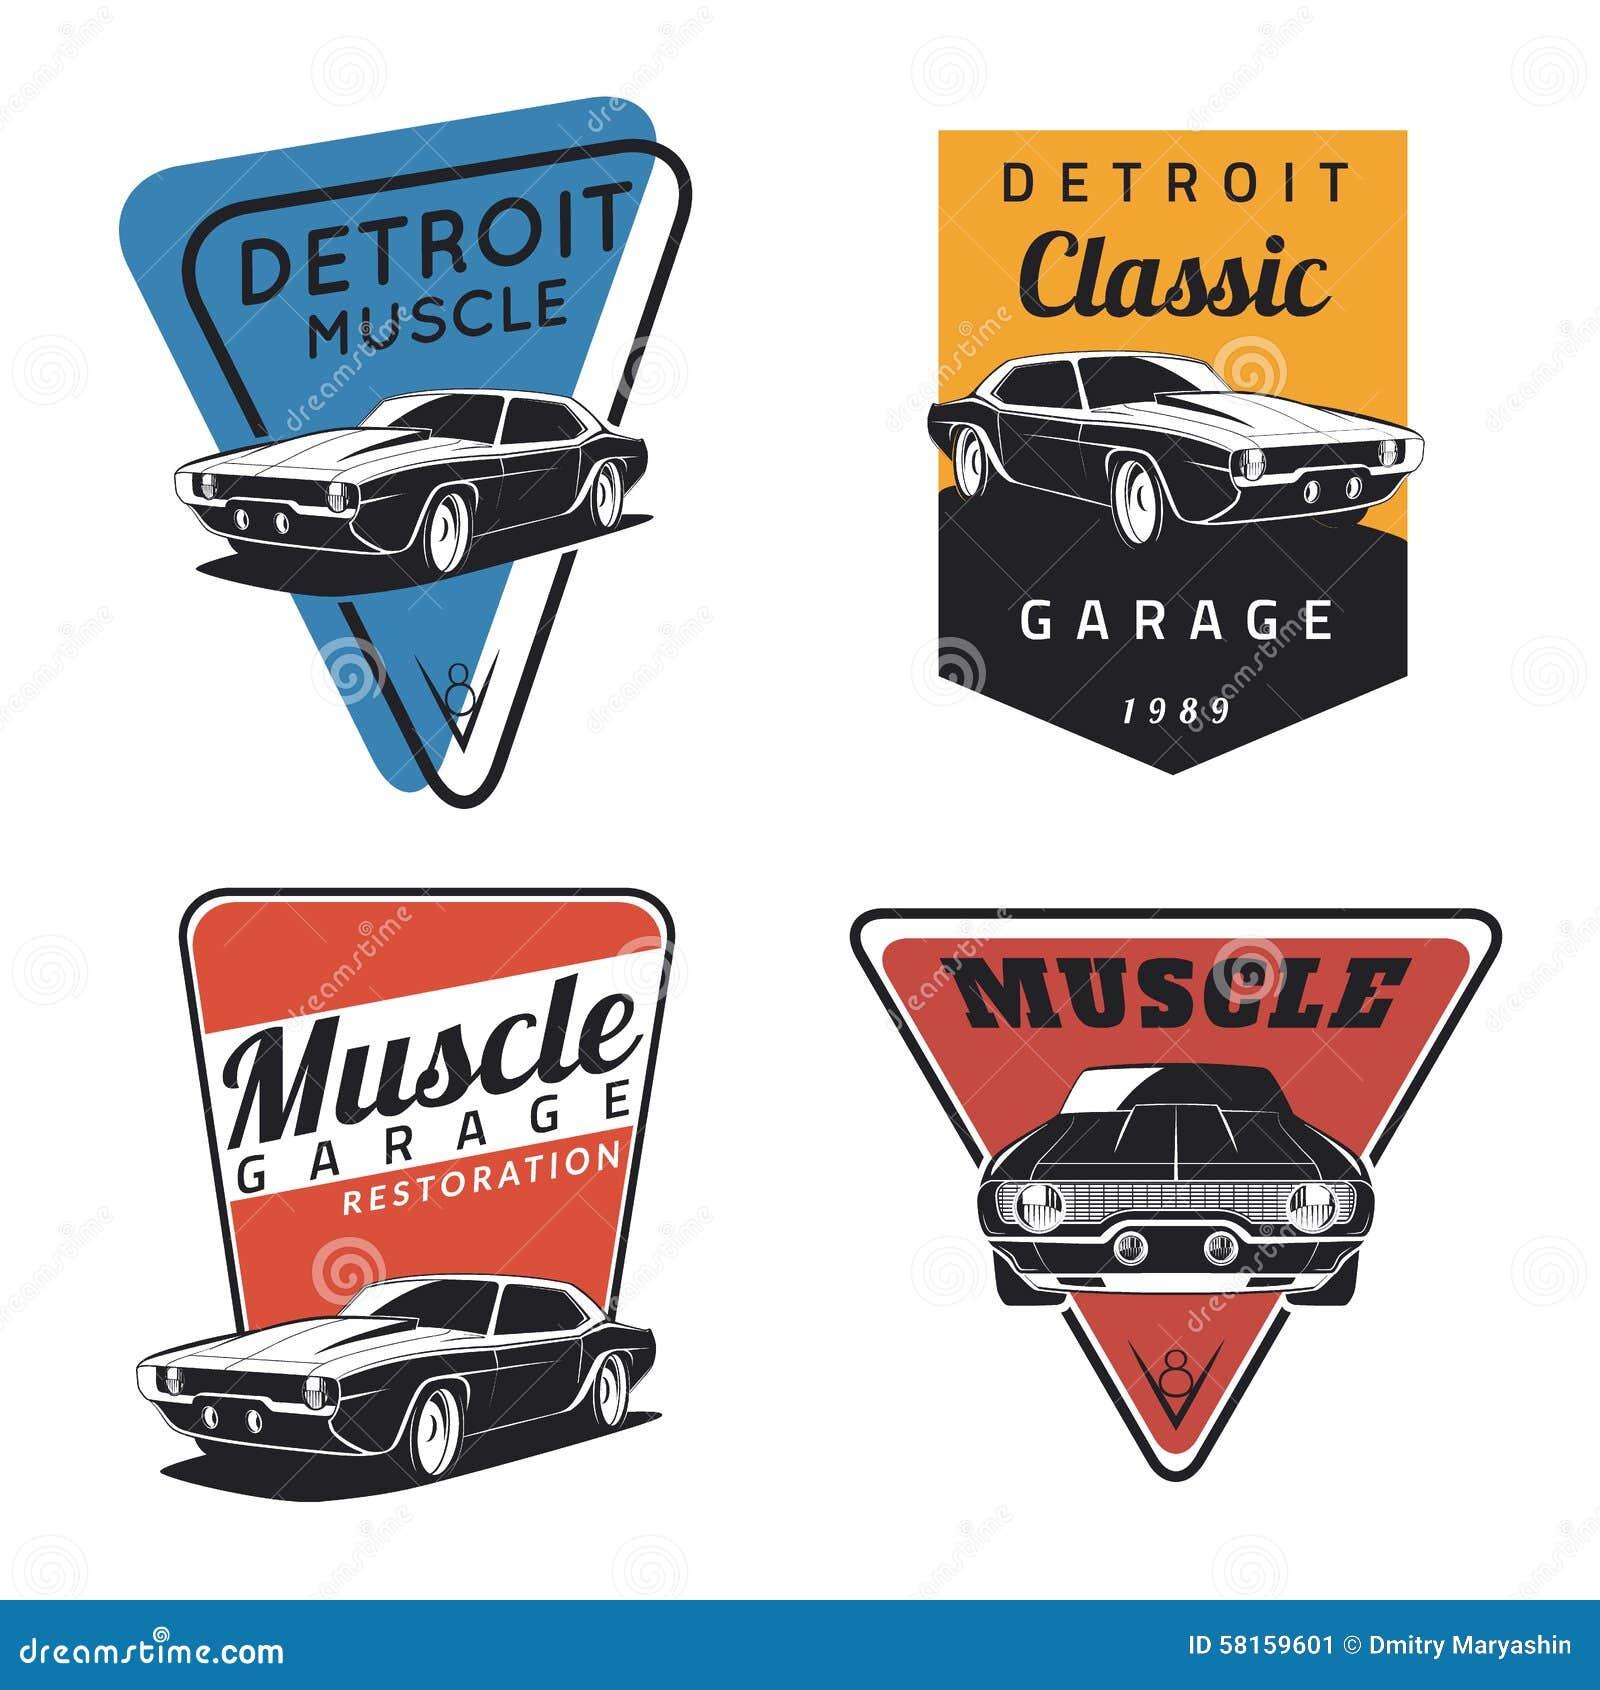 Muscle car garage logo black vector illustration for Auto motor club comparisons